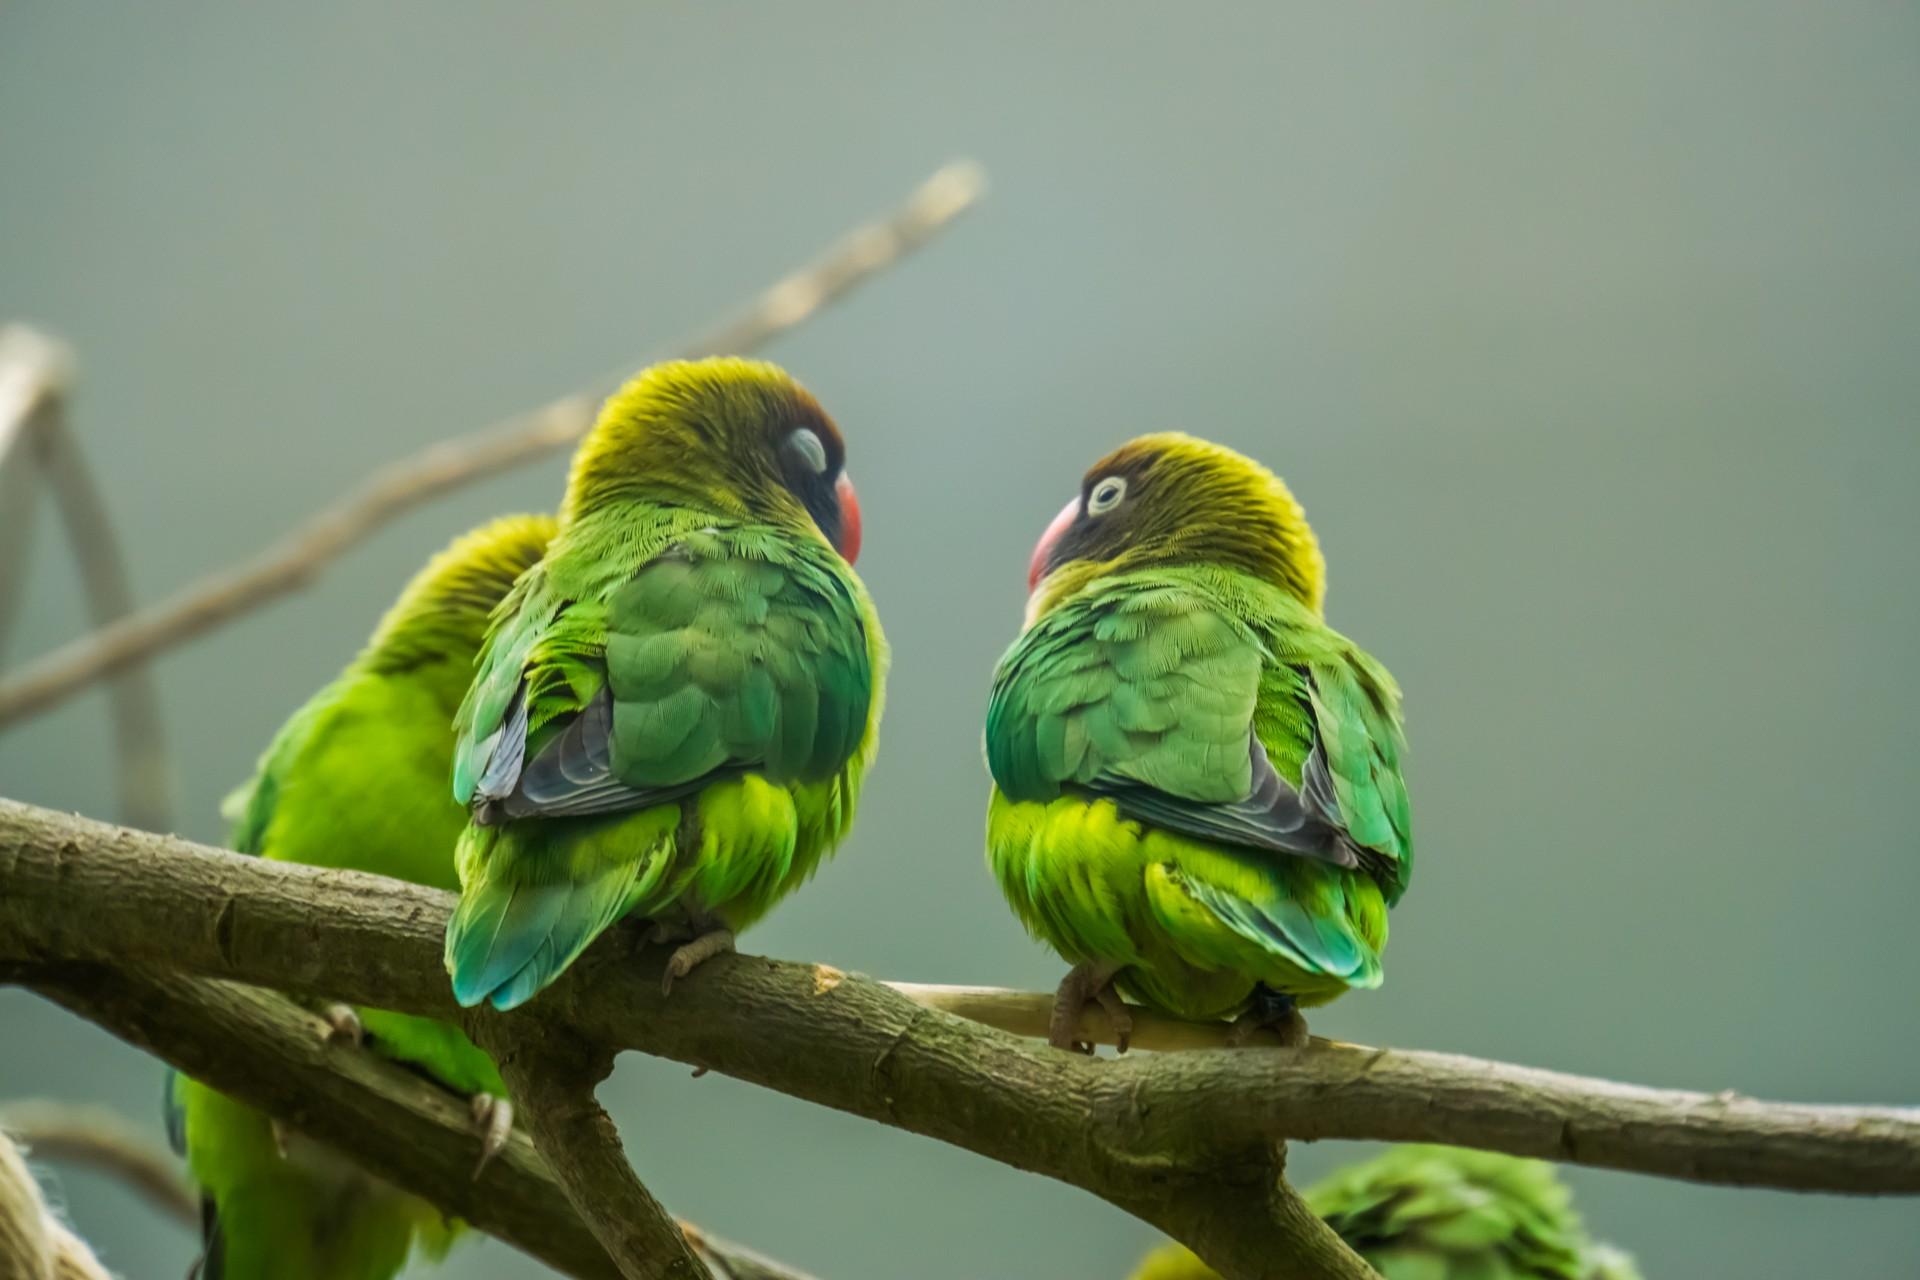 Wildlife of Zambia: Black-cheeked lovebirds